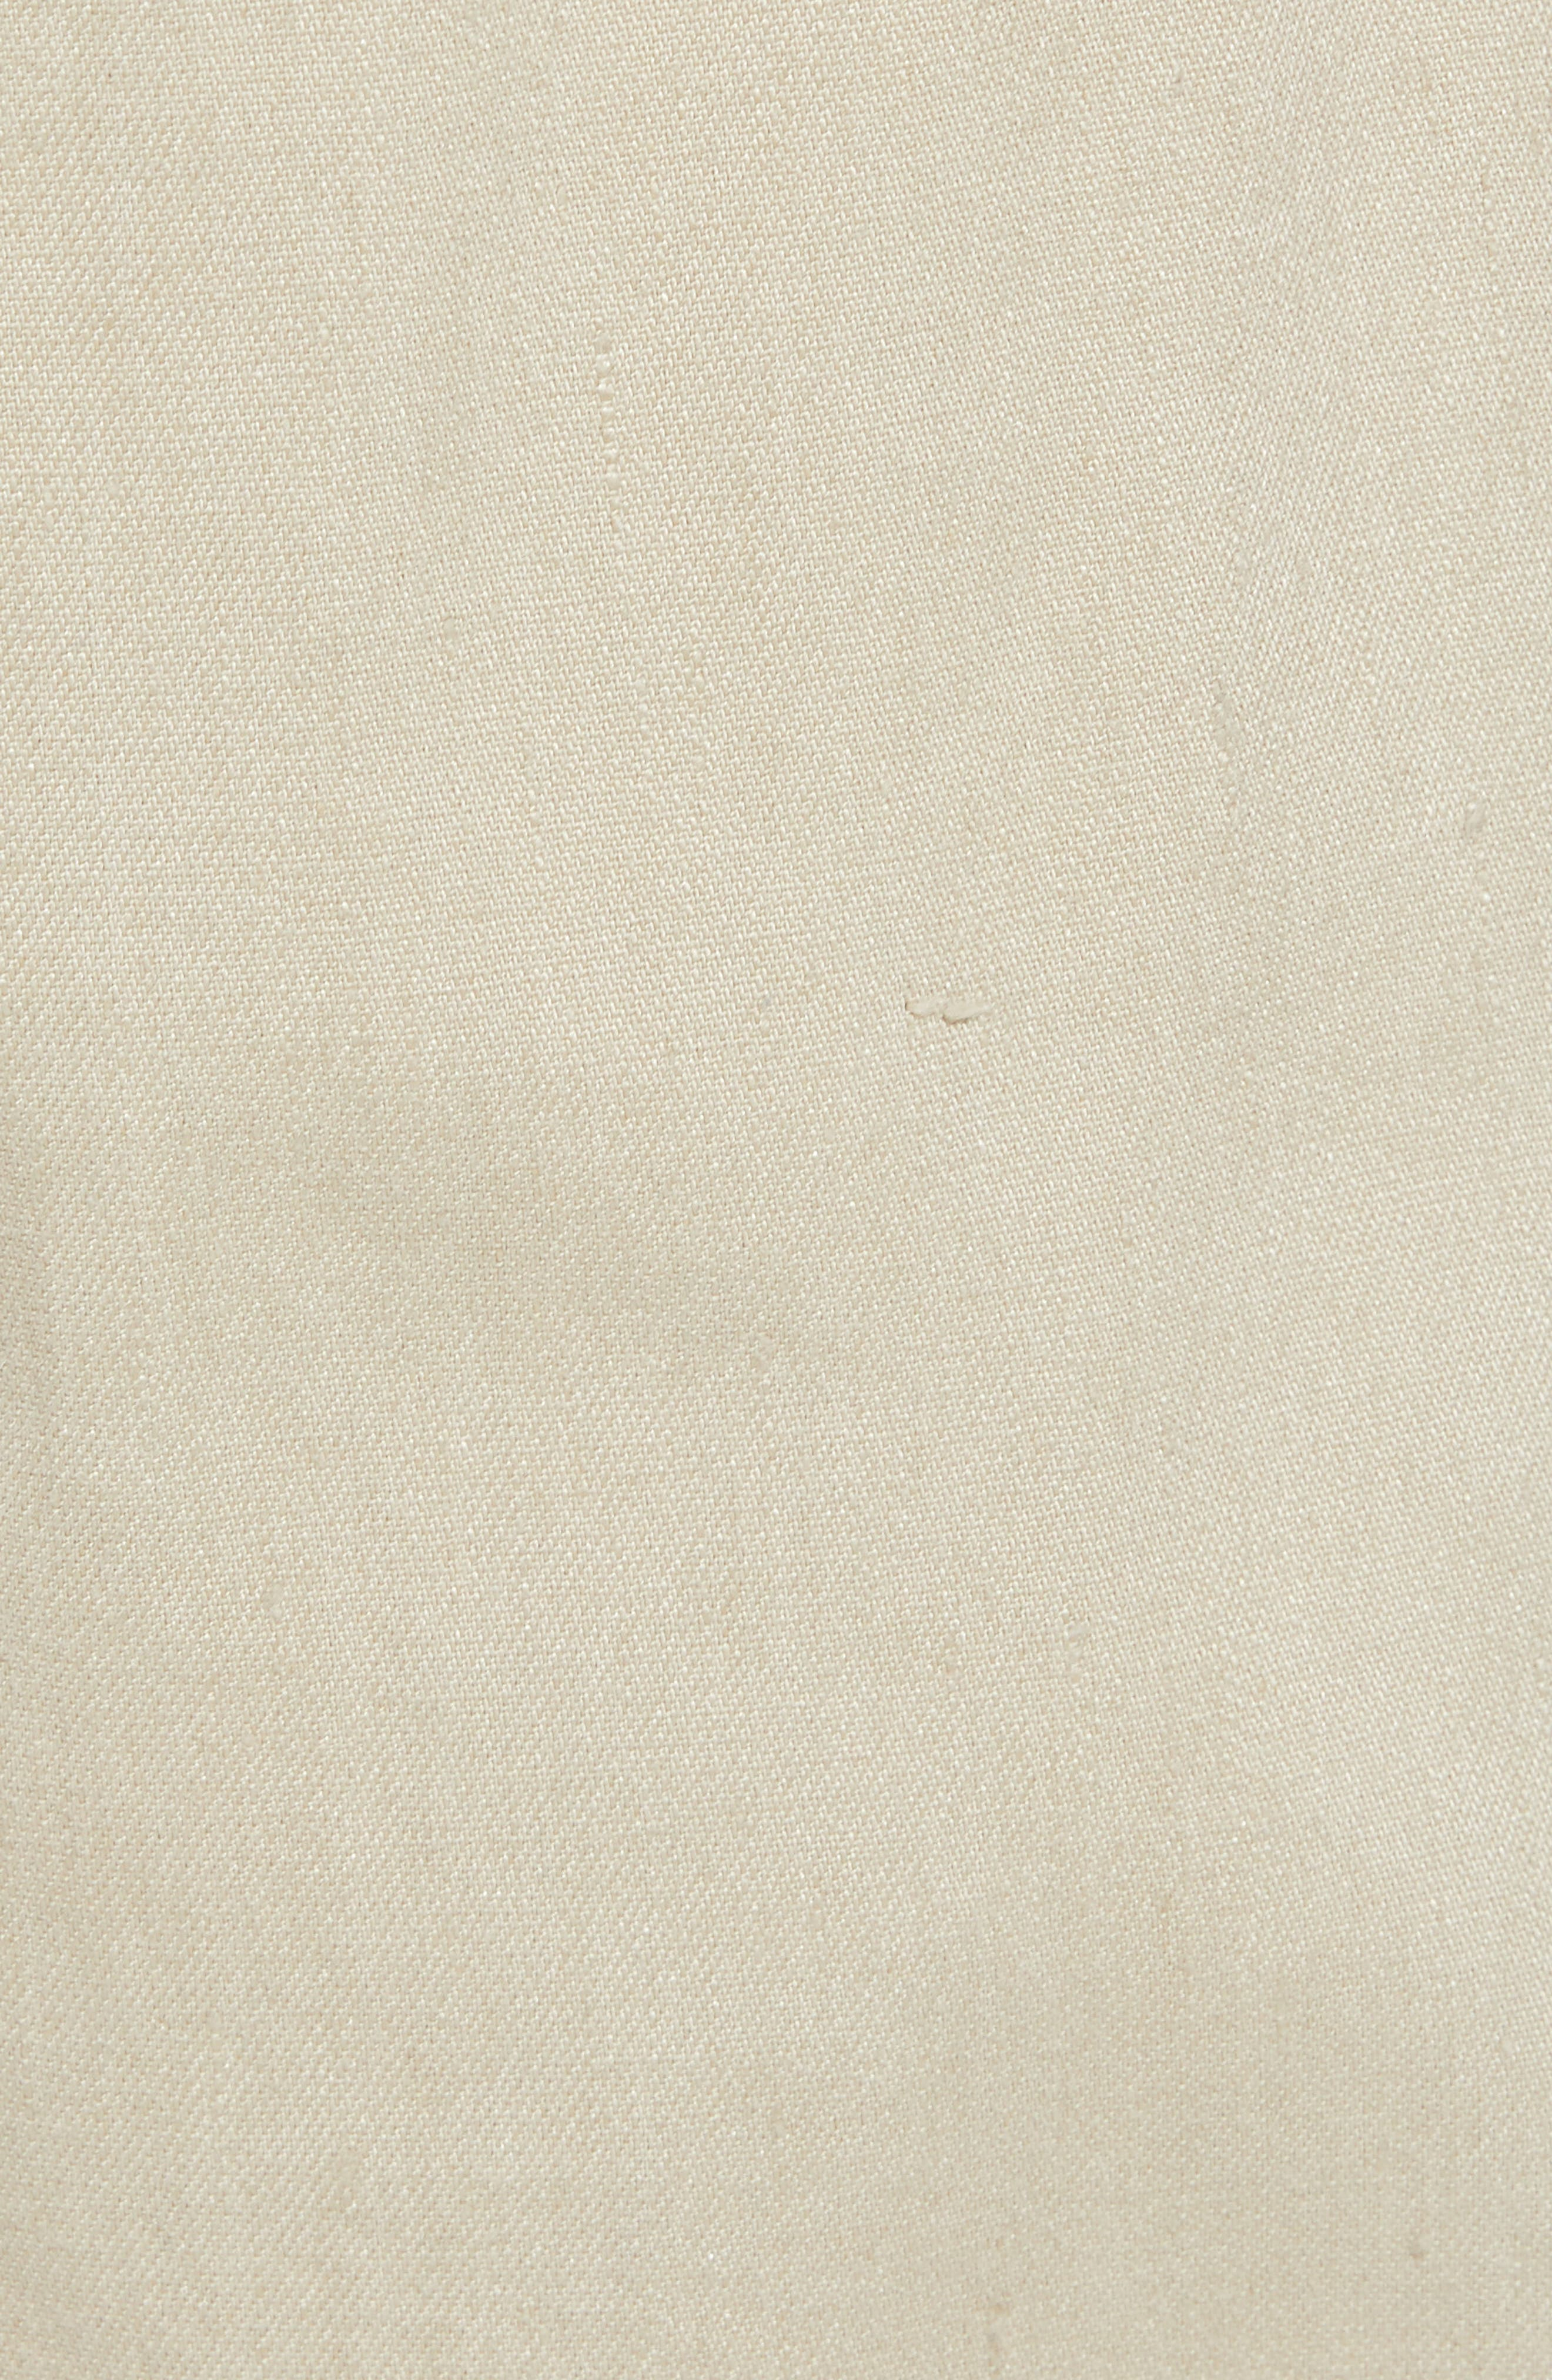 Stretch Linen & Cotton Cargo Shorts,                             Alternate thumbnail 5, color,                             Flax